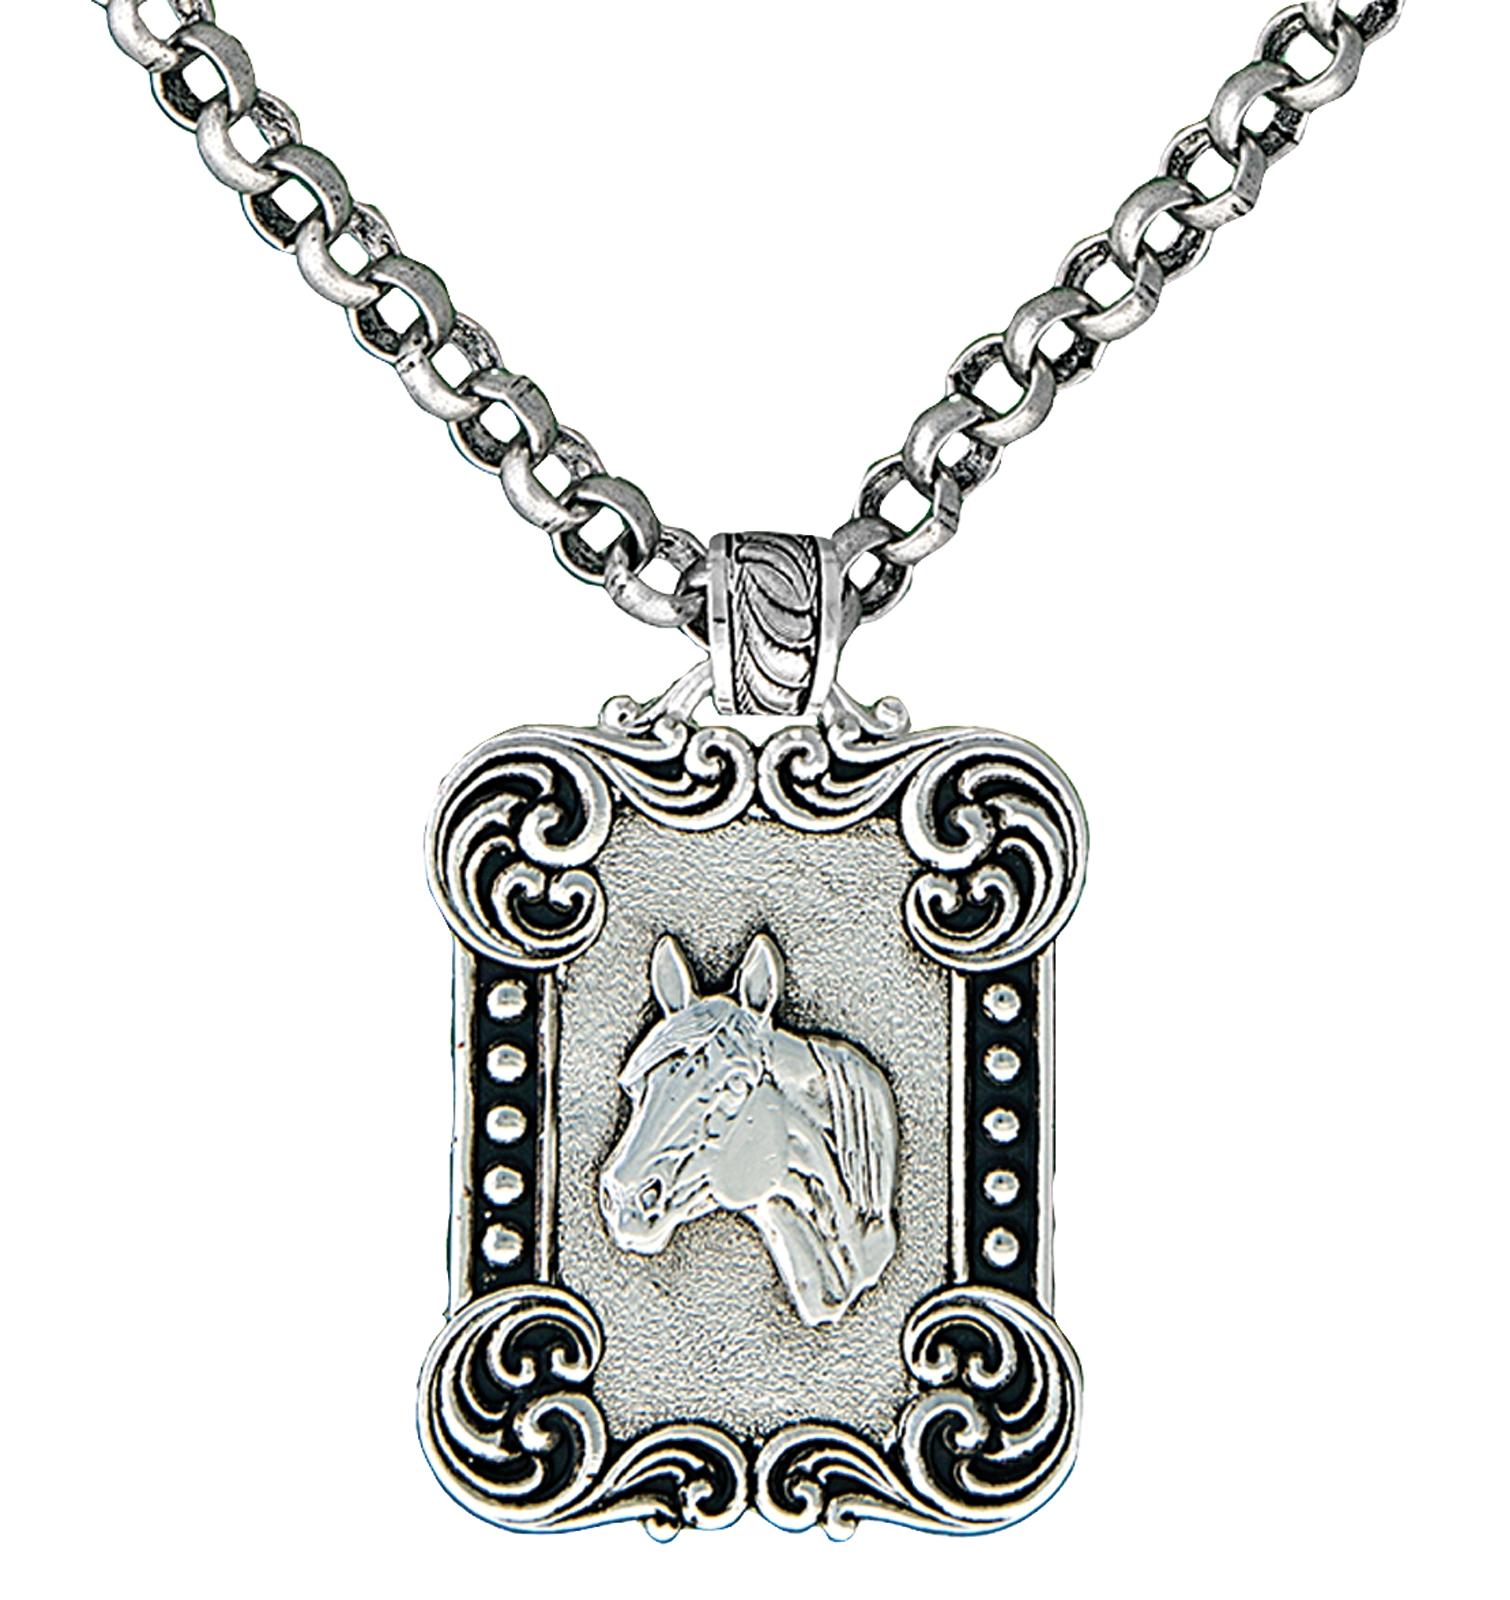 Montana Silversmiths Western Deco Rider's Cameo Necklace